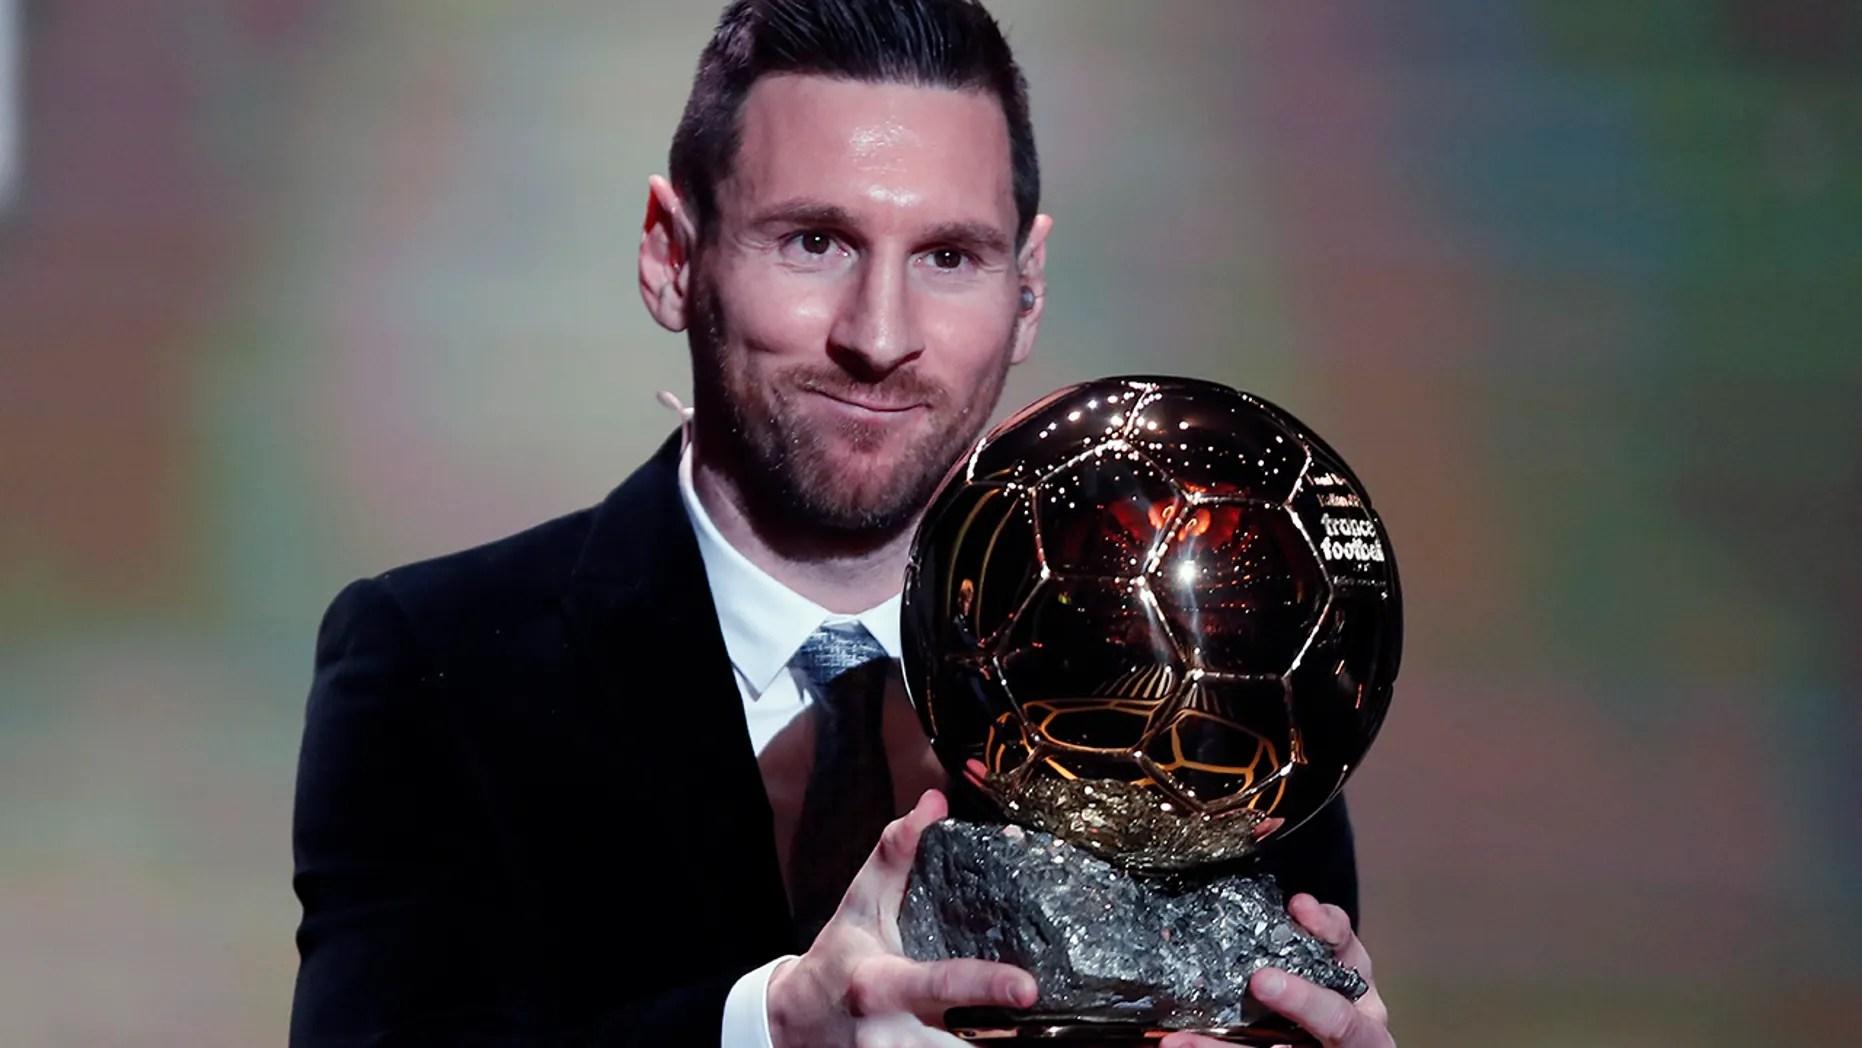 Messi Us Captain Rapinoe Win Ballon D Or Awards Fox News